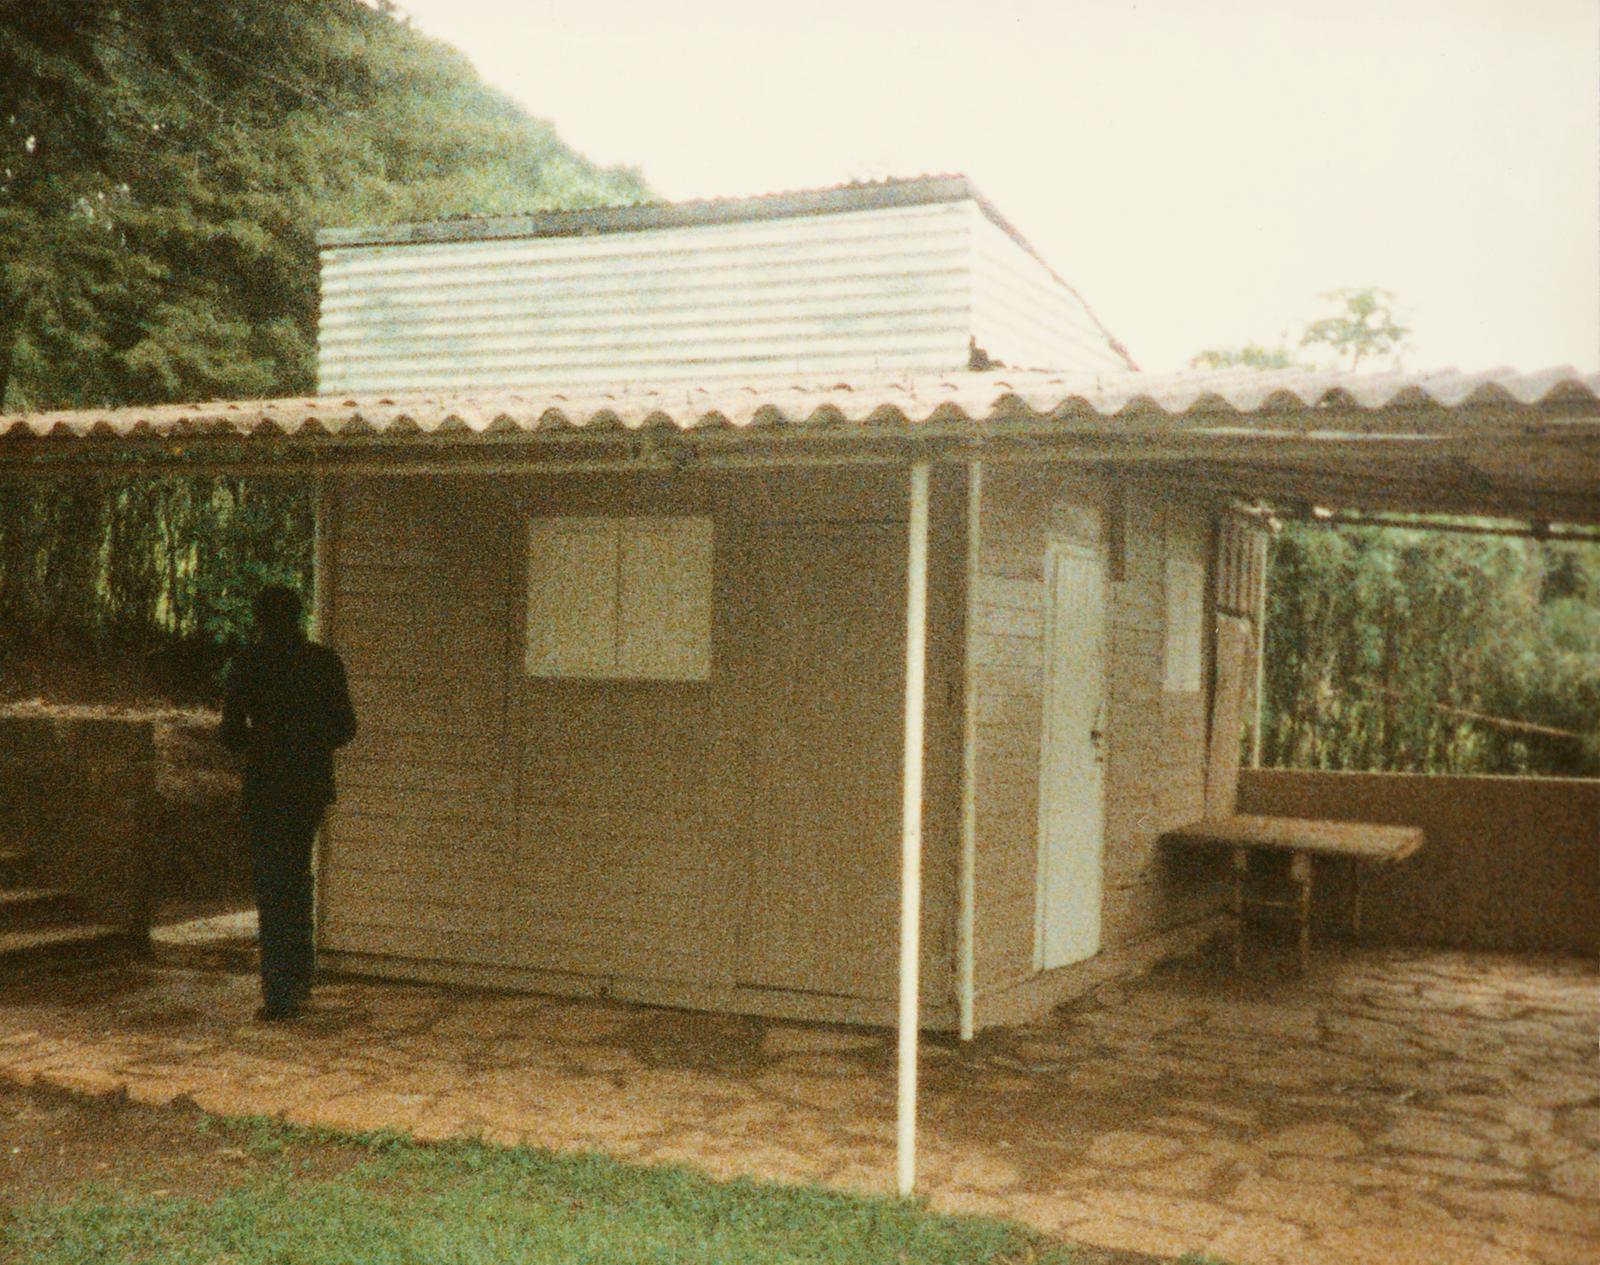 Kigali - Recreation/Community Center/Gym/Theater - 1987